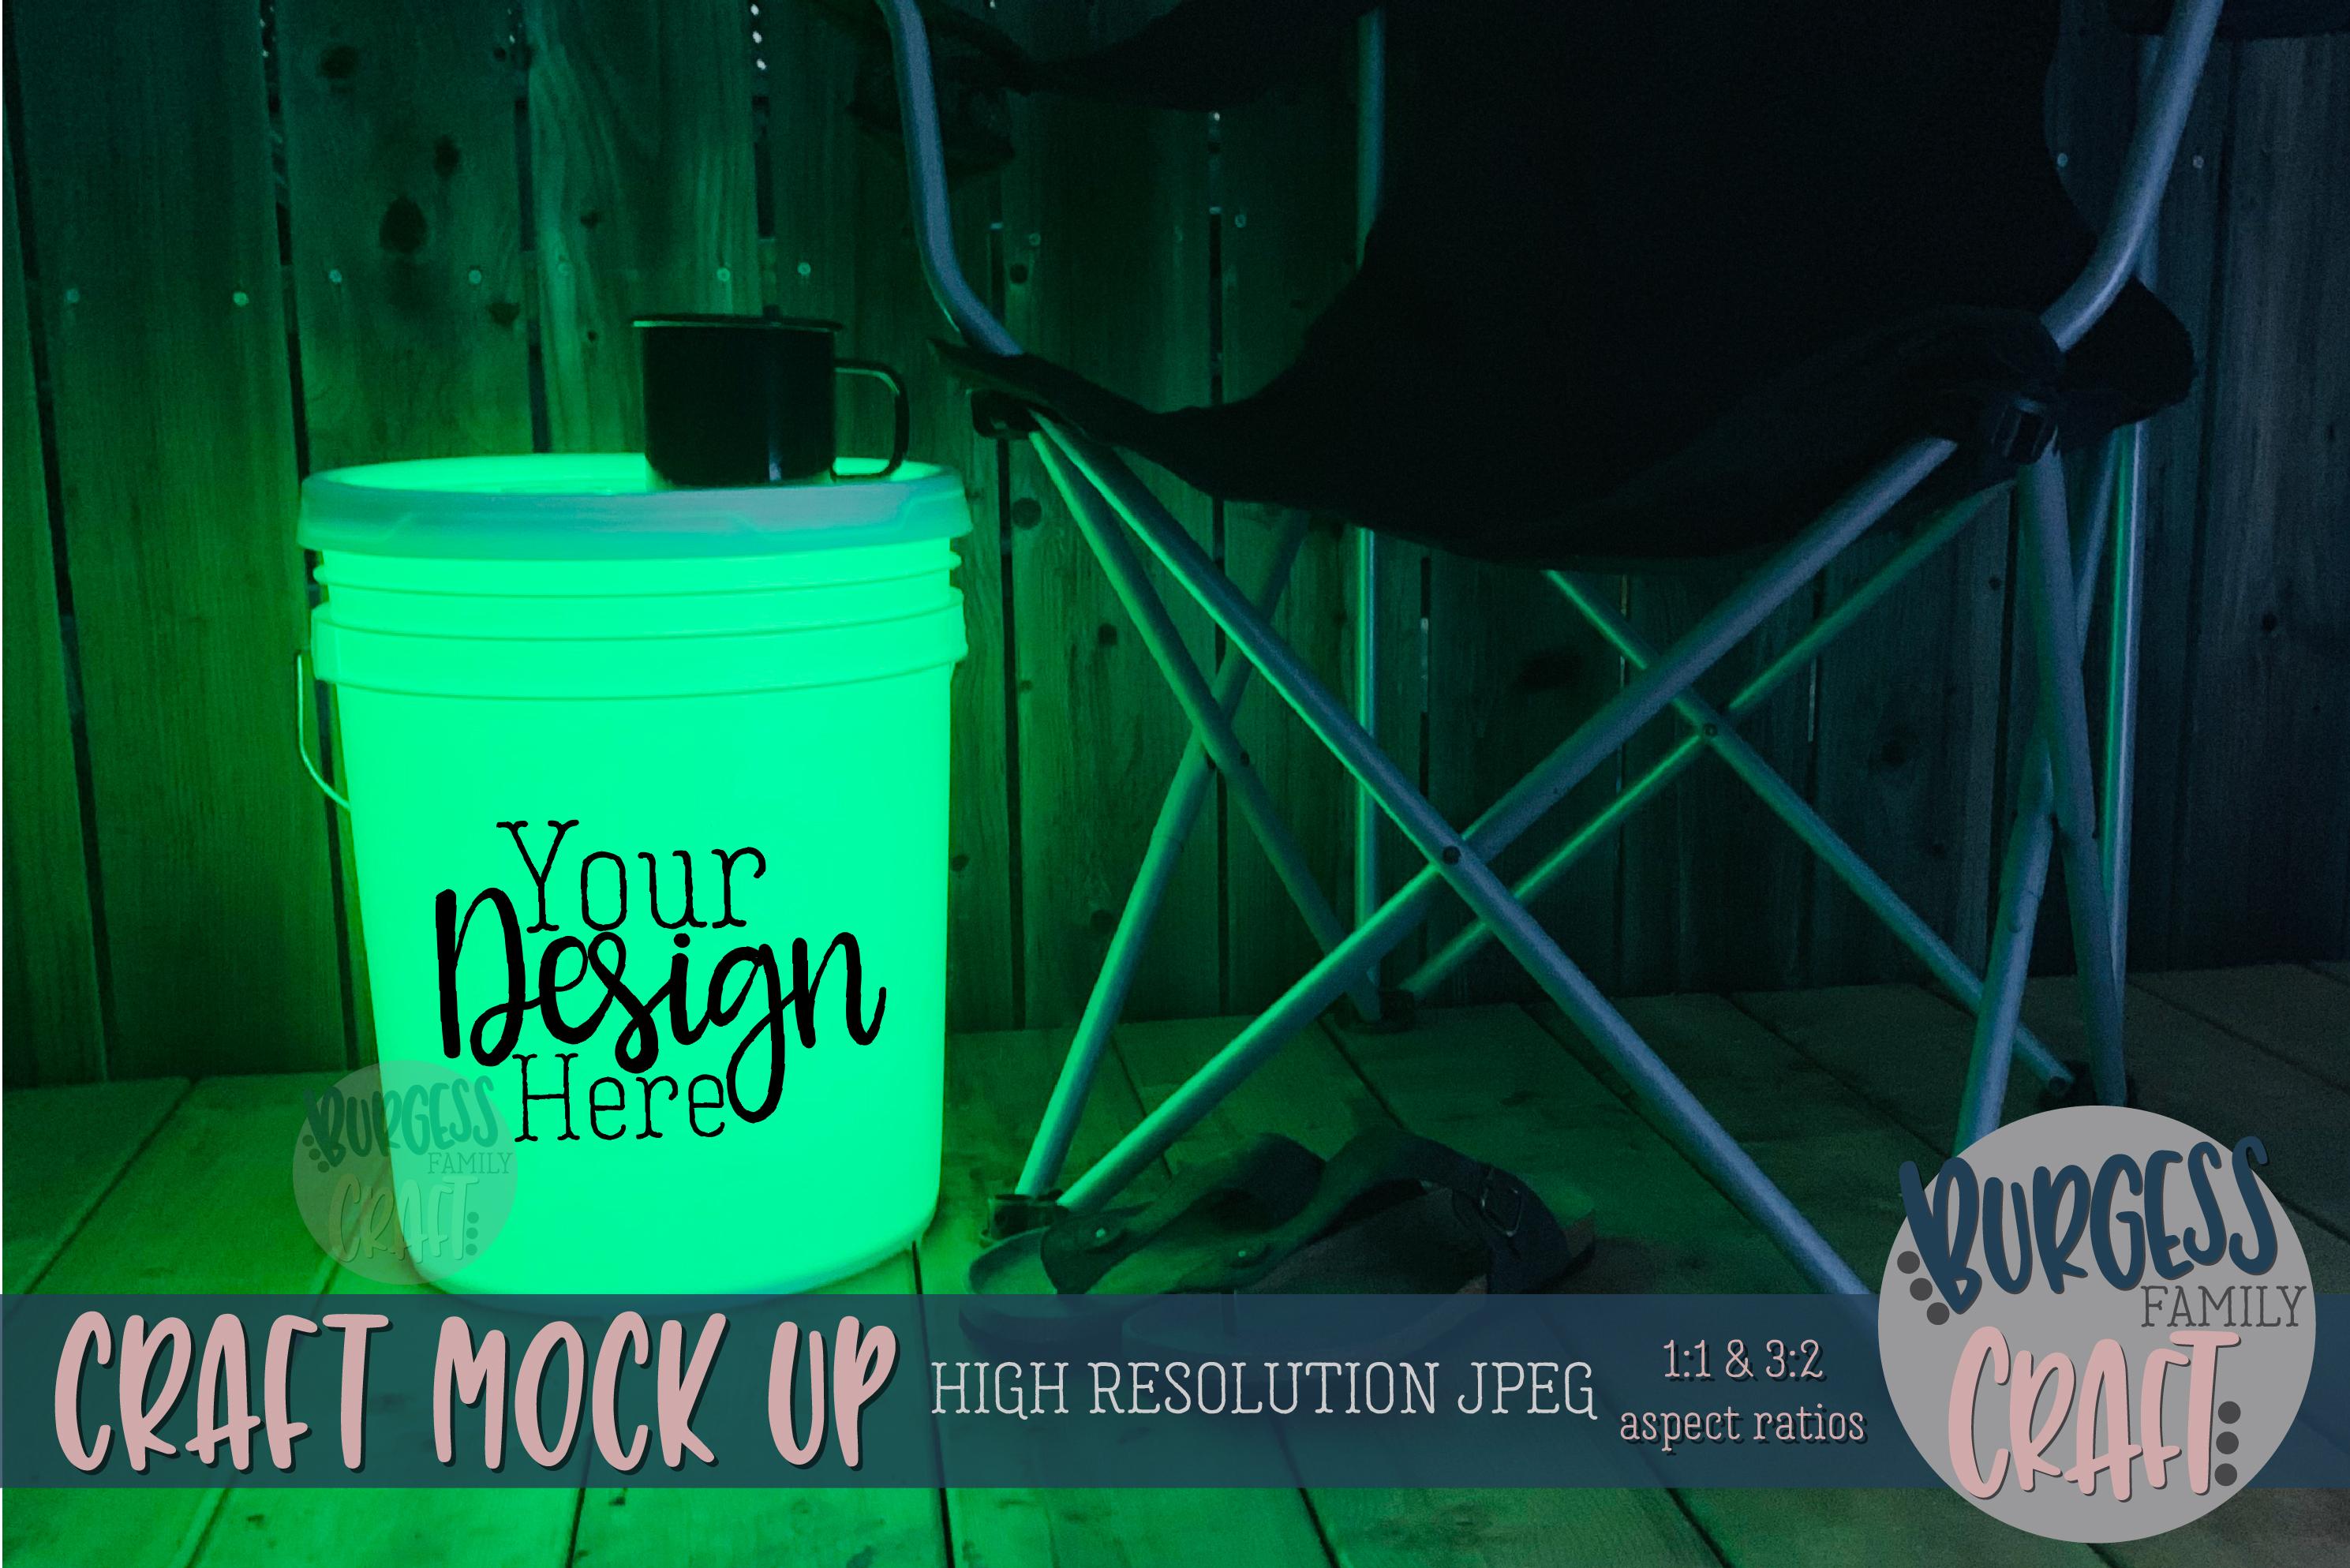 Bucket light table green Craft mock up| High Resolution JPEG example image 1